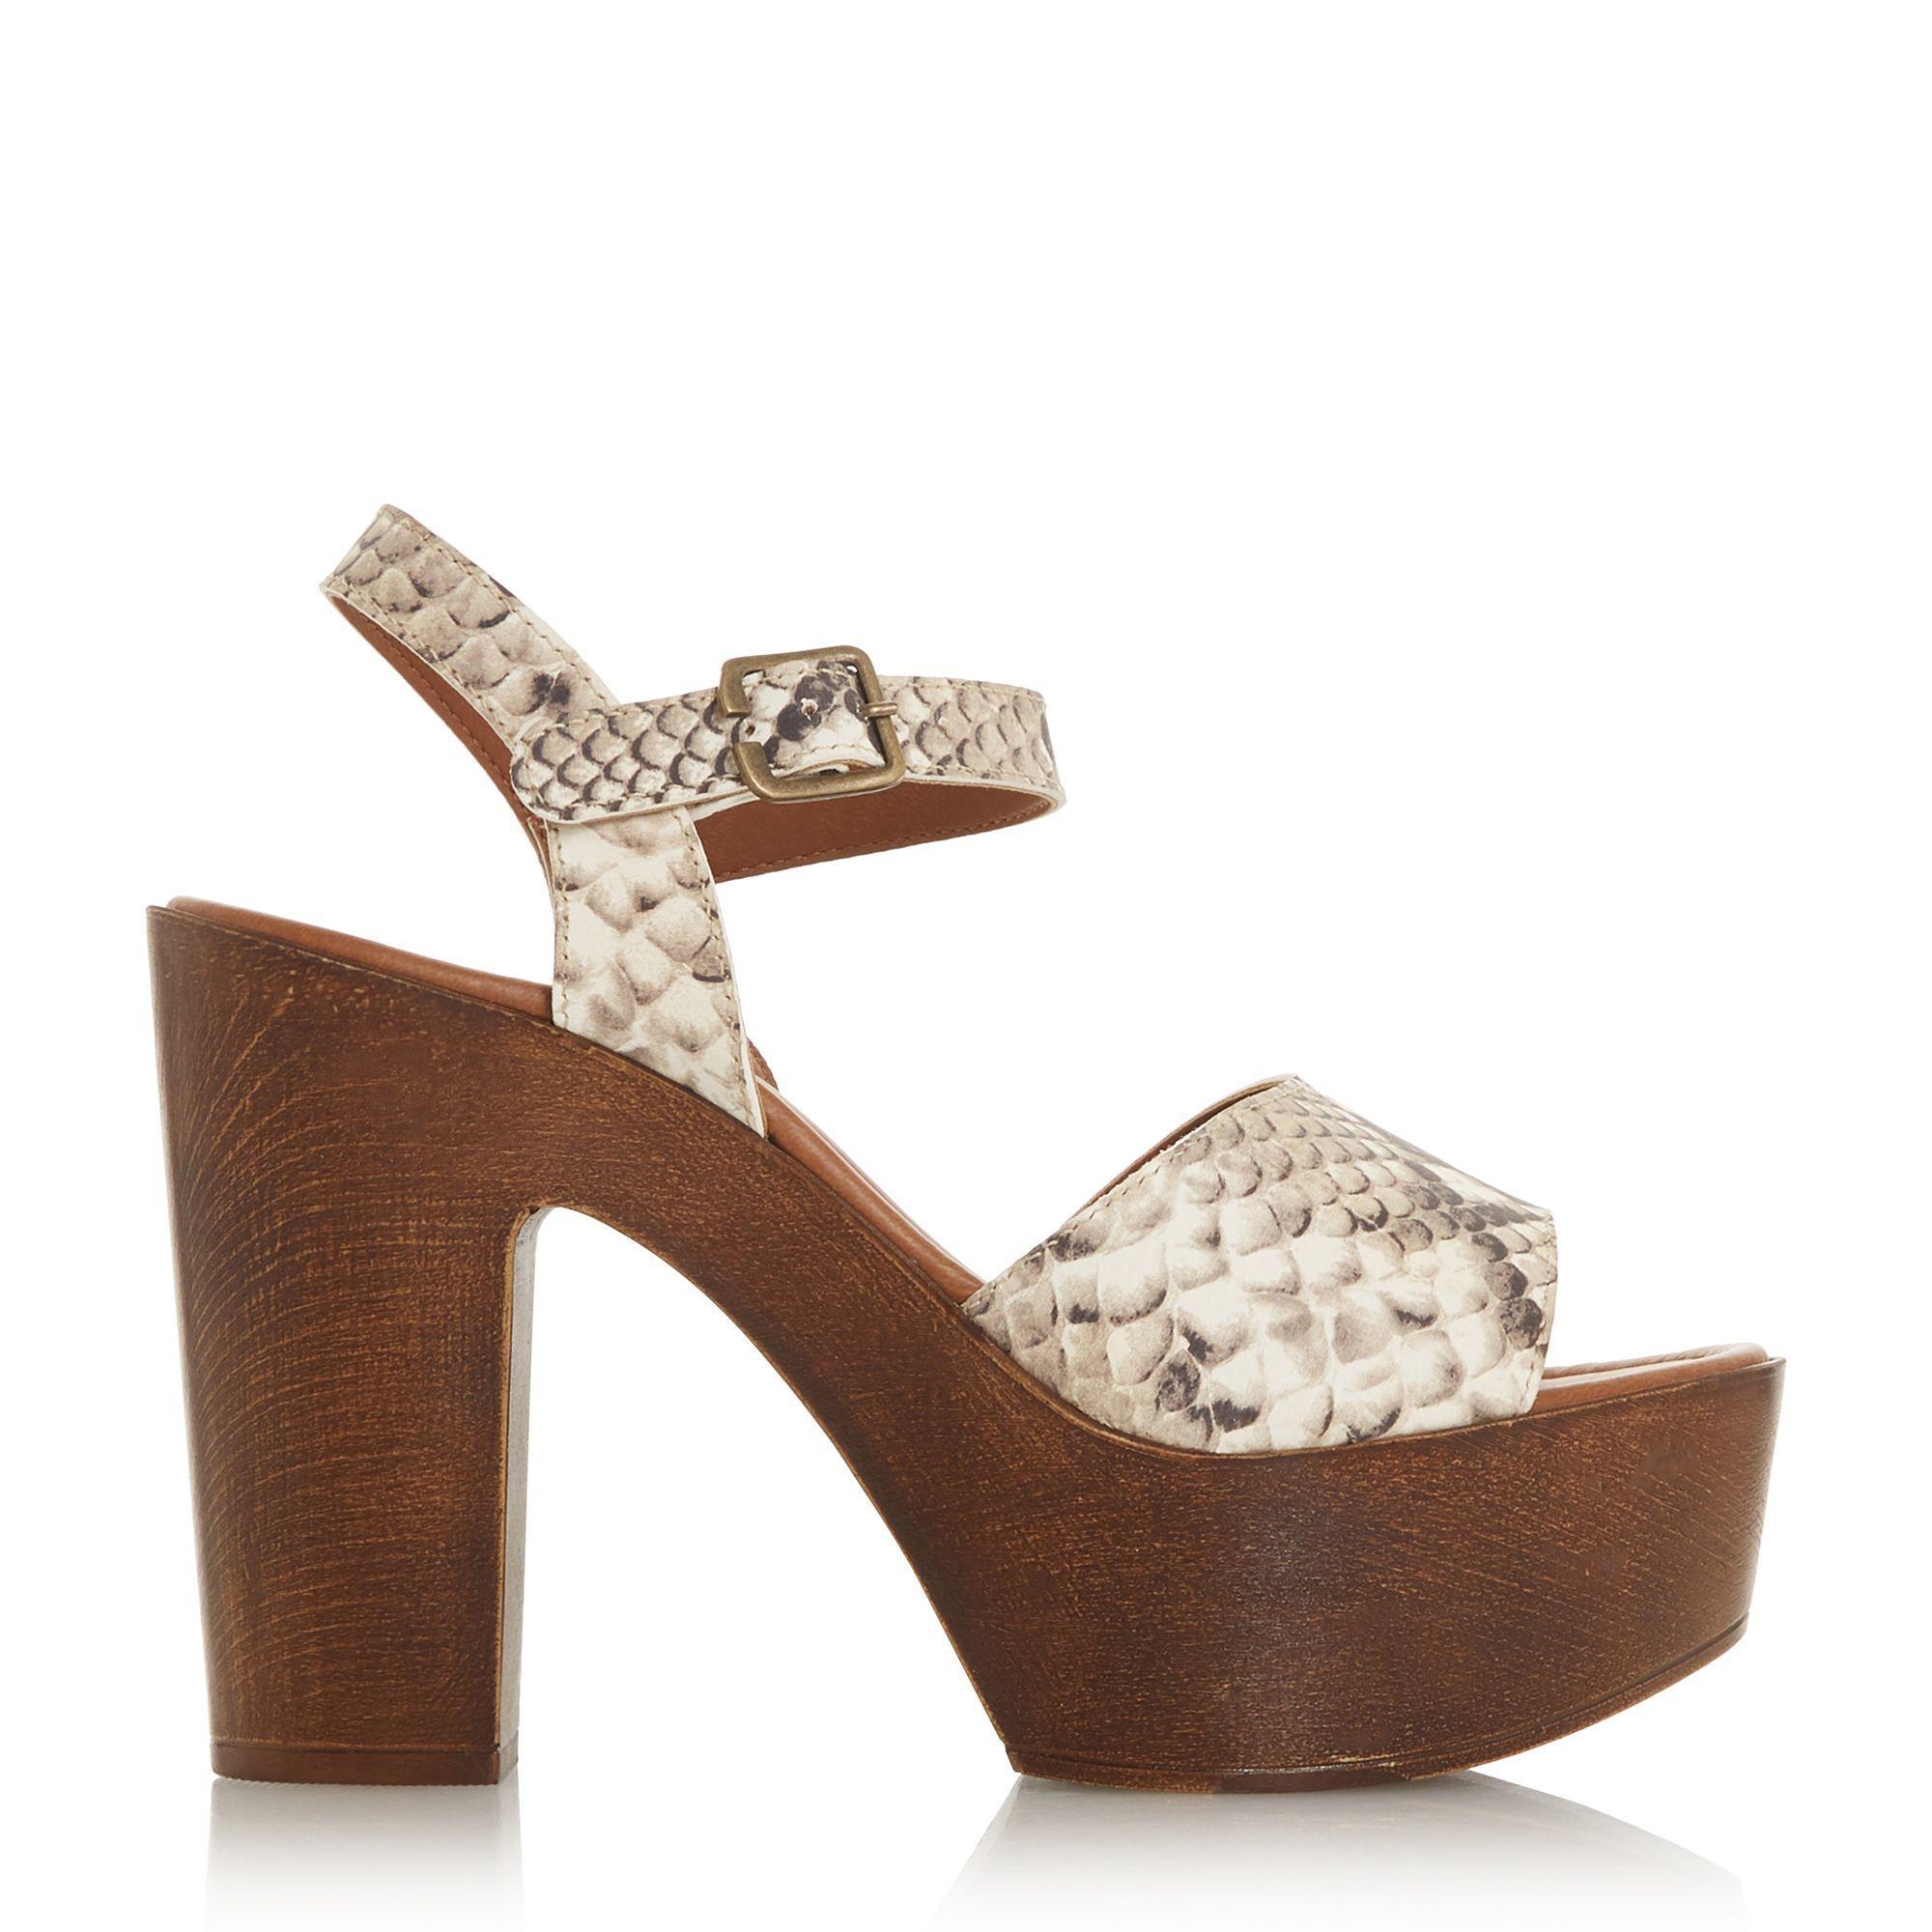 62dacac47b4 Steve Madden Natural Leather  lulla  High Platform Peep Toe Sandals ...